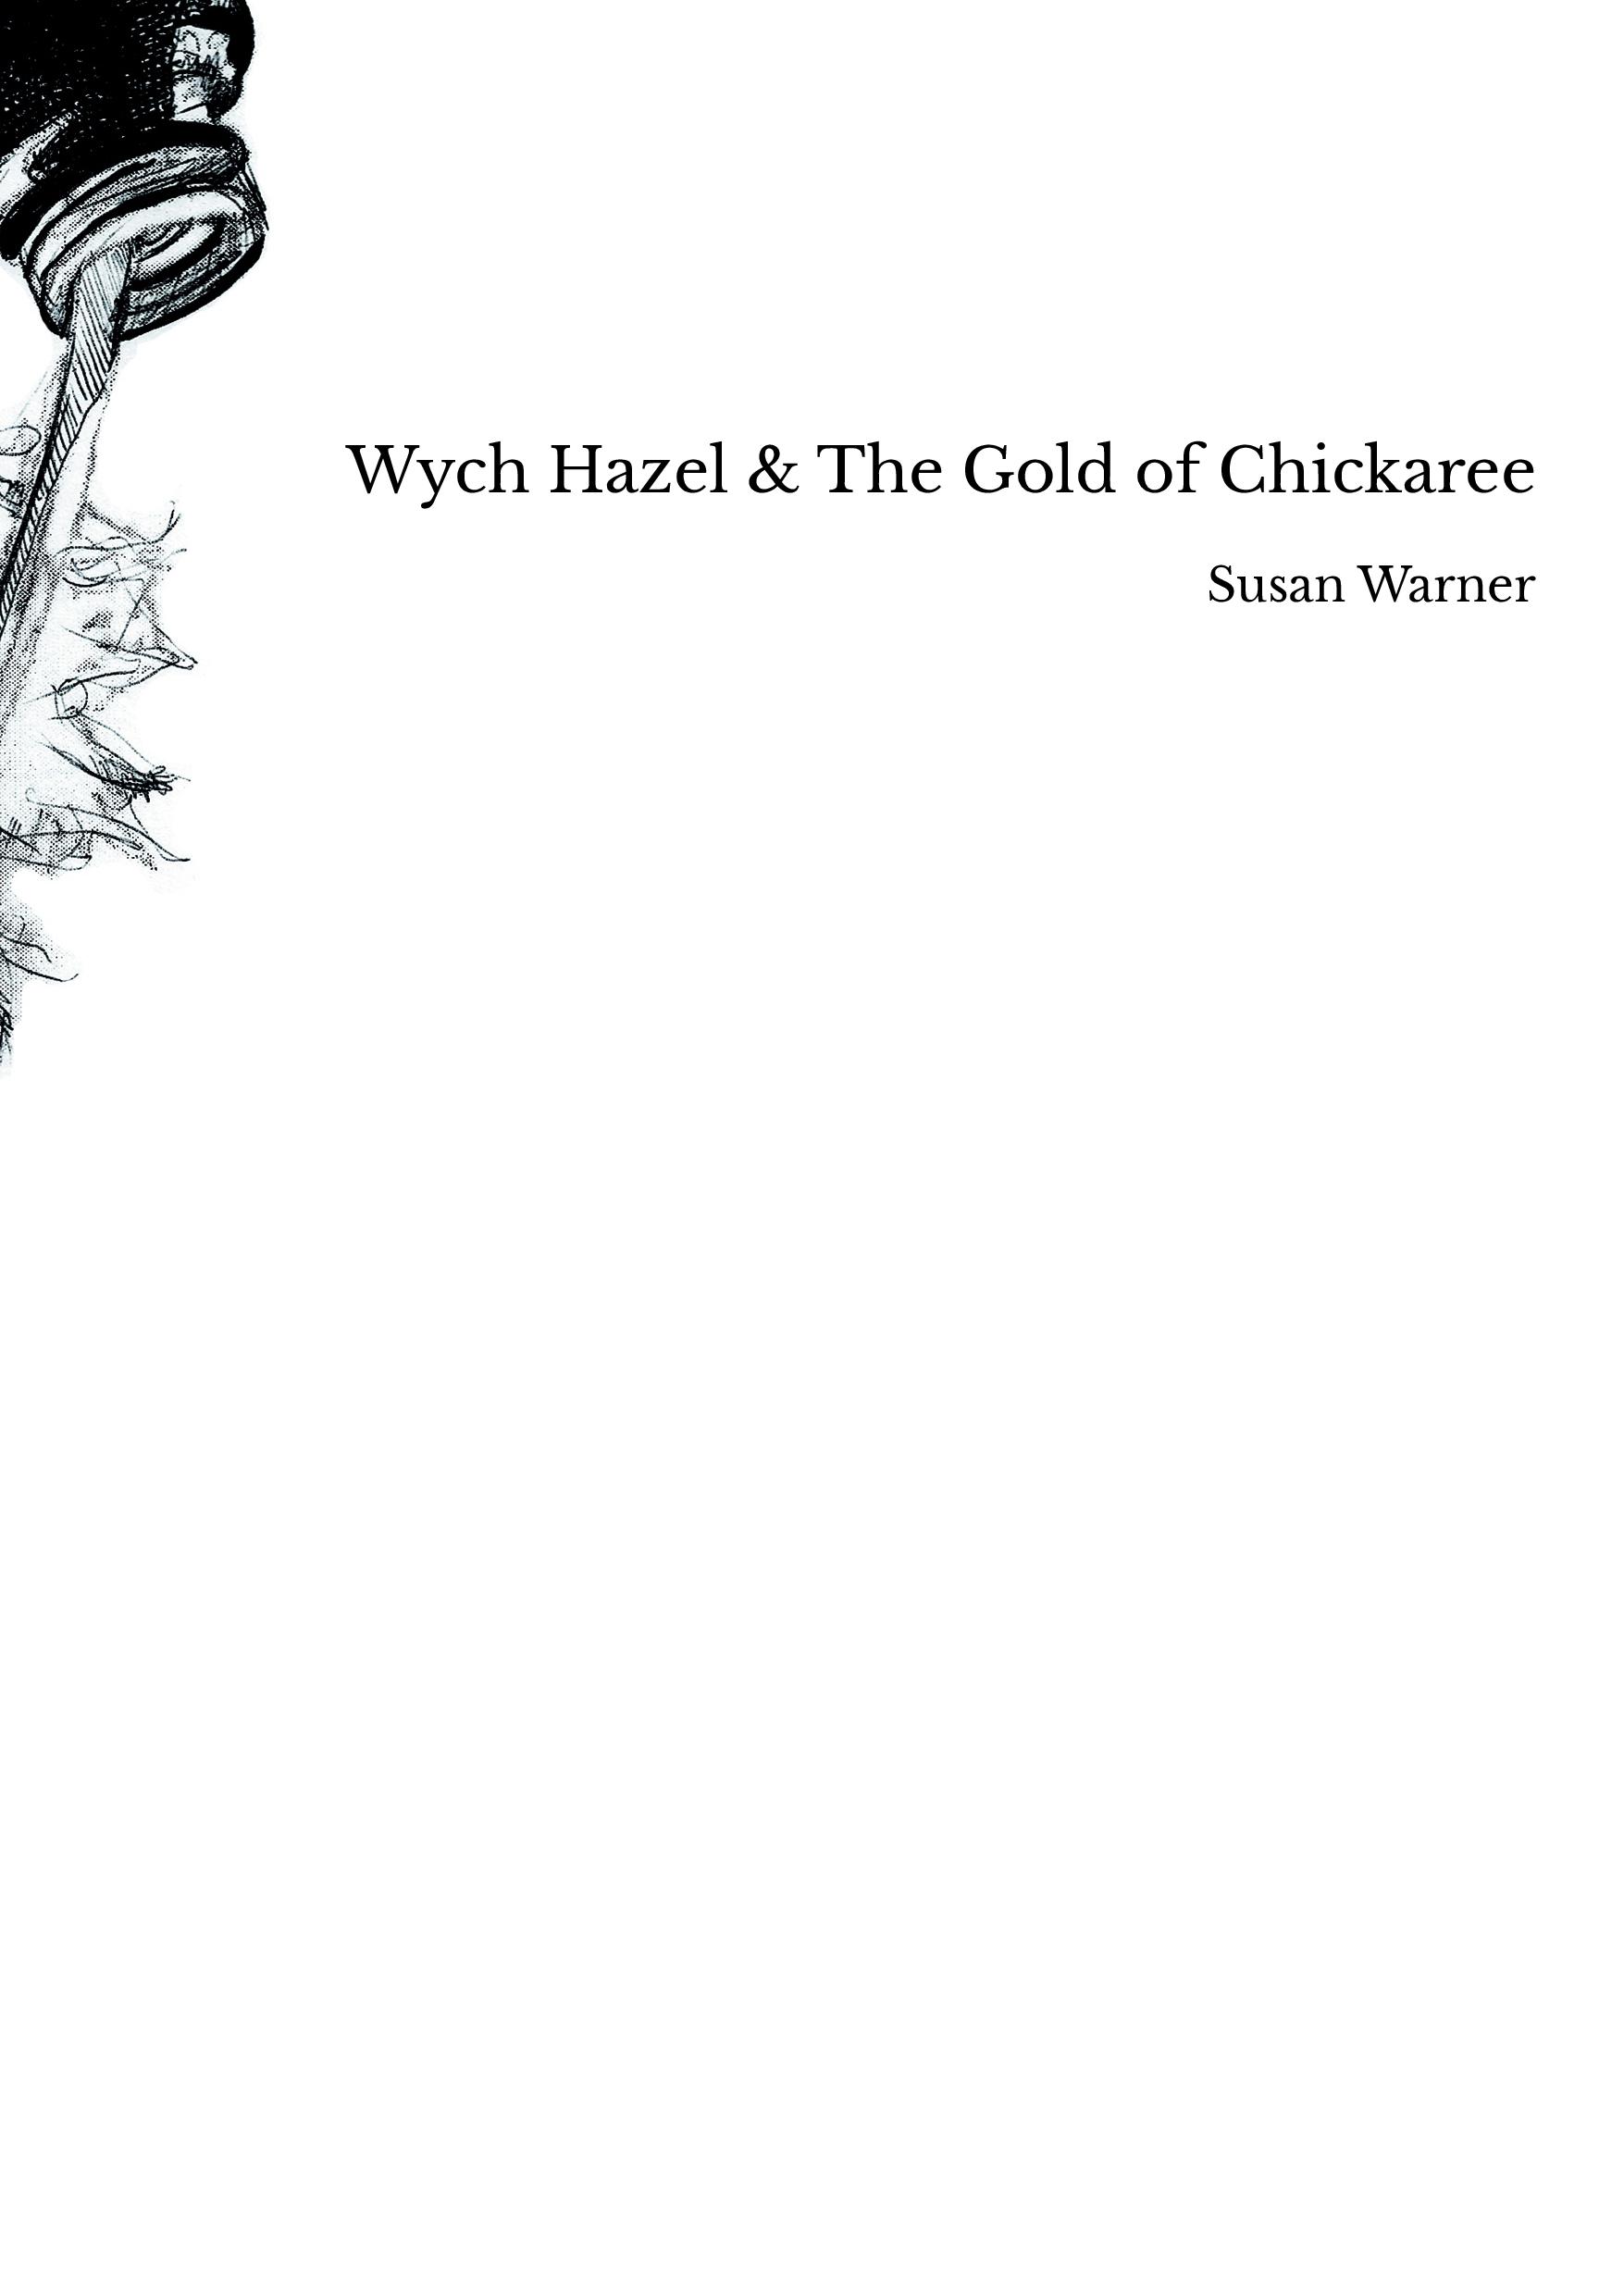 Wych Hazel & The Gold of Chickaree